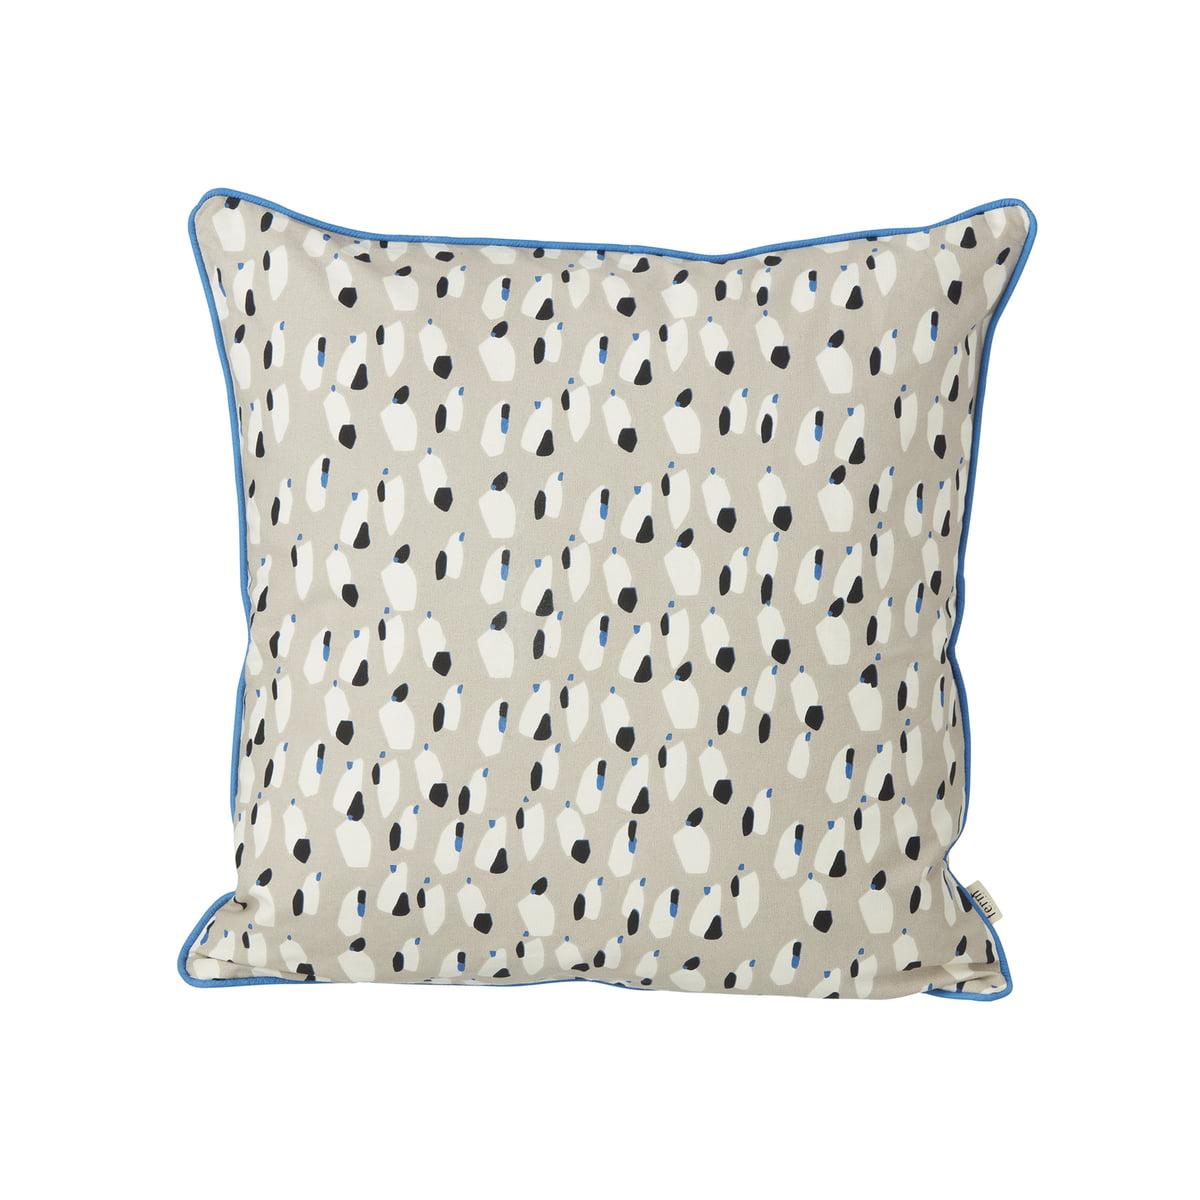 spotted kissen von ferm living bei. Black Bedroom Furniture Sets. Home Design Ideas